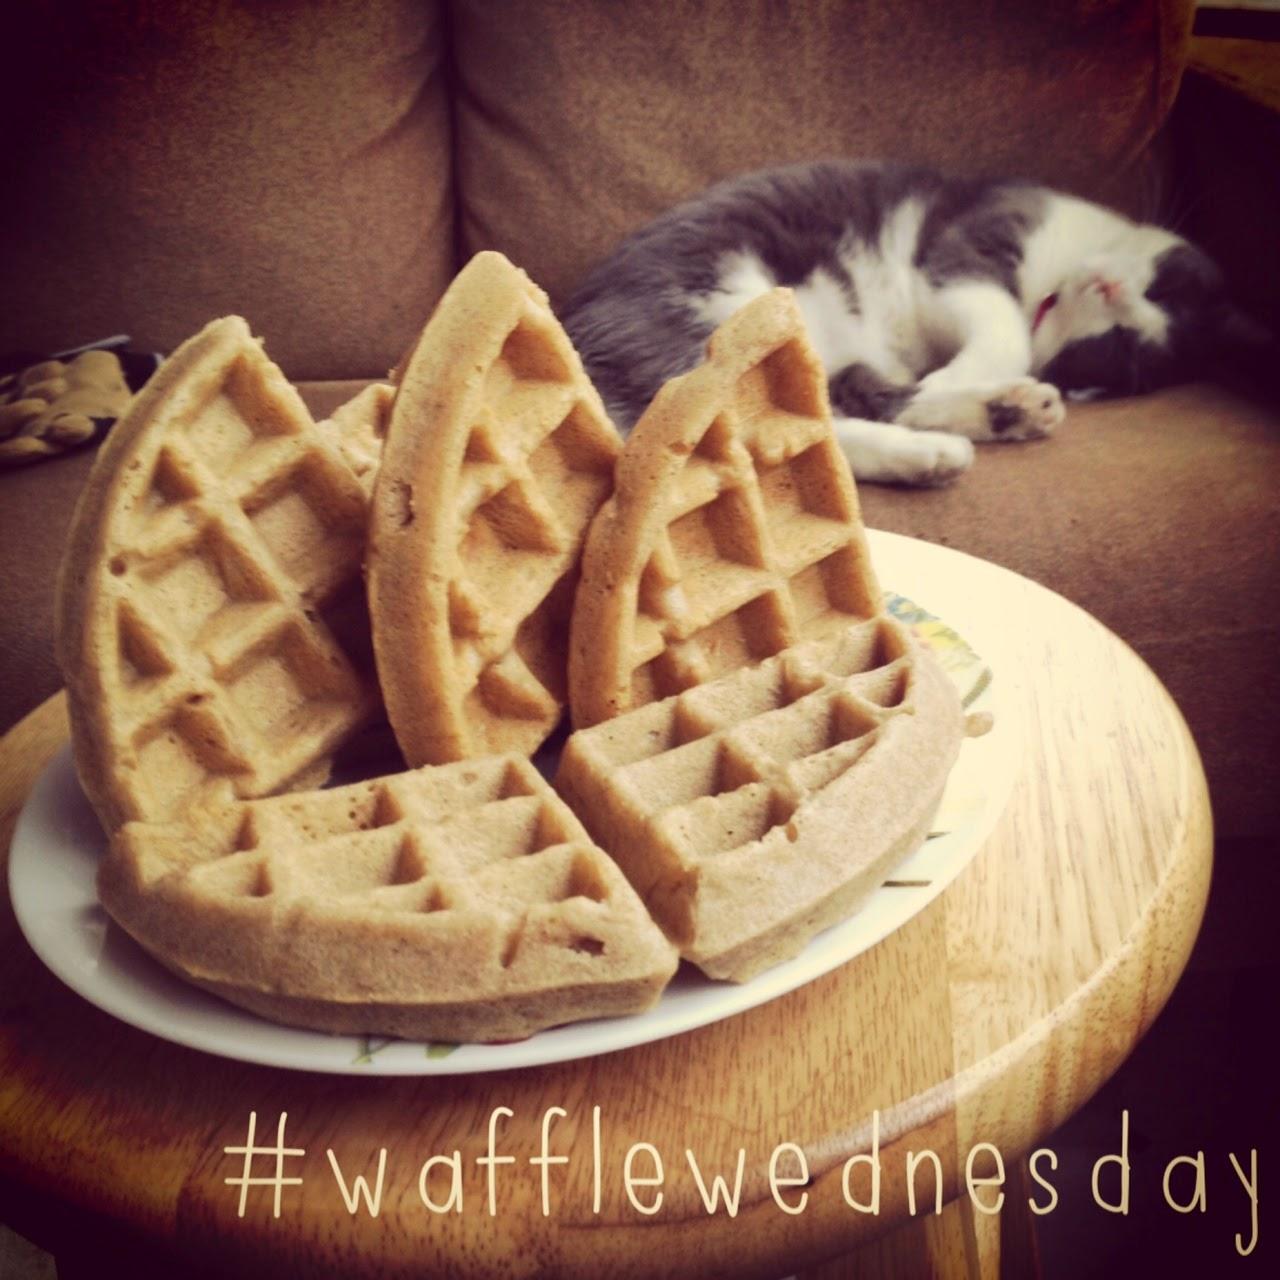 waffle Wednesday, gluten free waffles